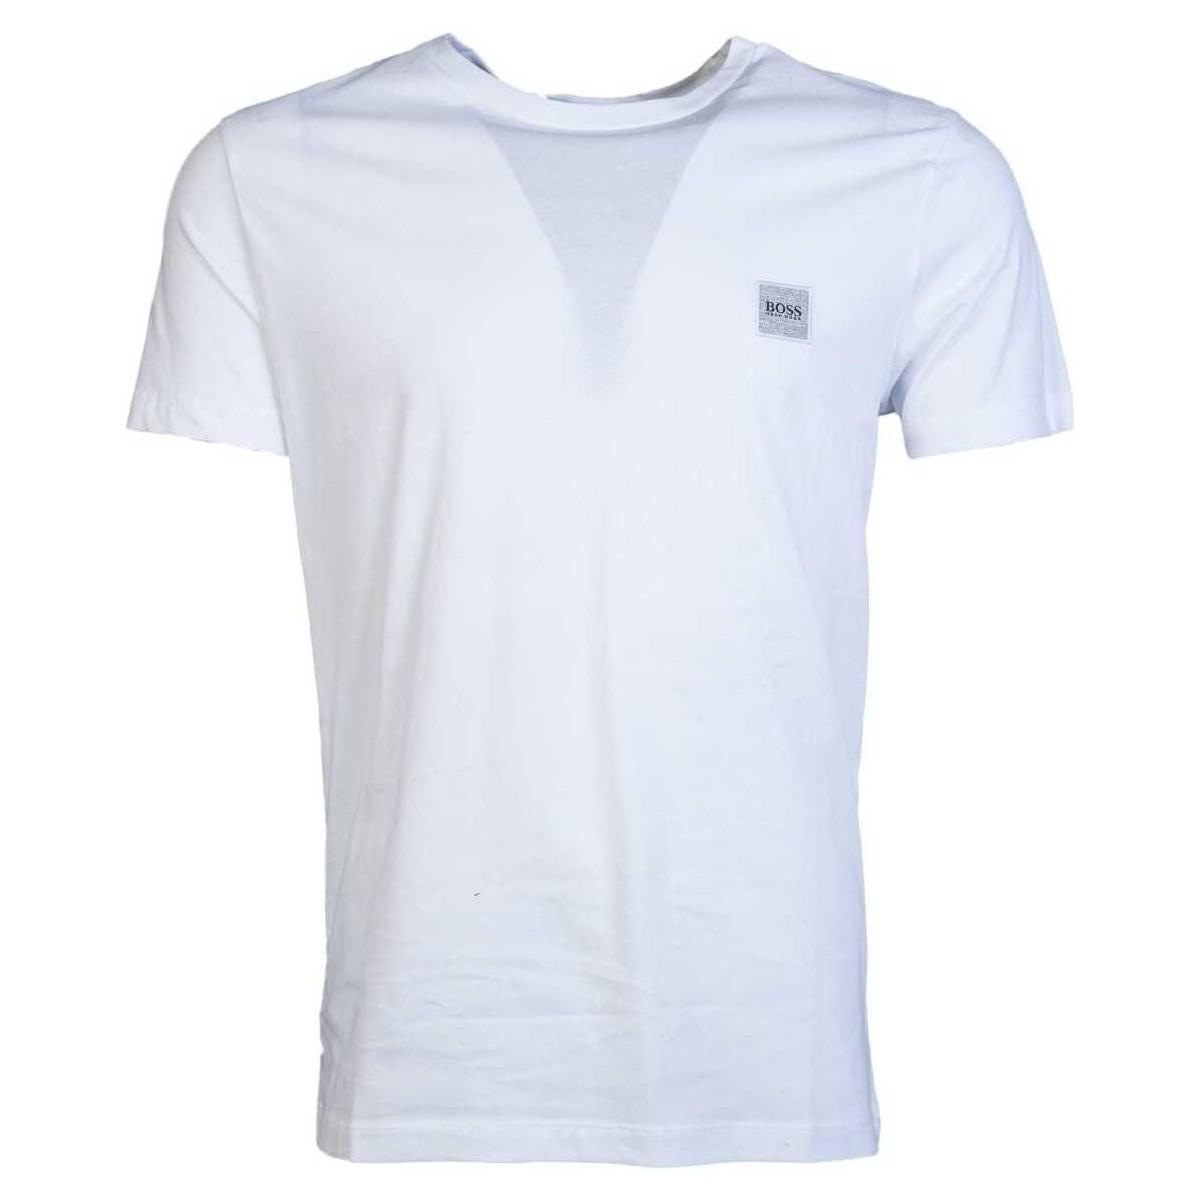 28e7187e5 BOSS T Shirt Model Quot;tommi Uk 50328440 Quot; Men's T Shirt In ...